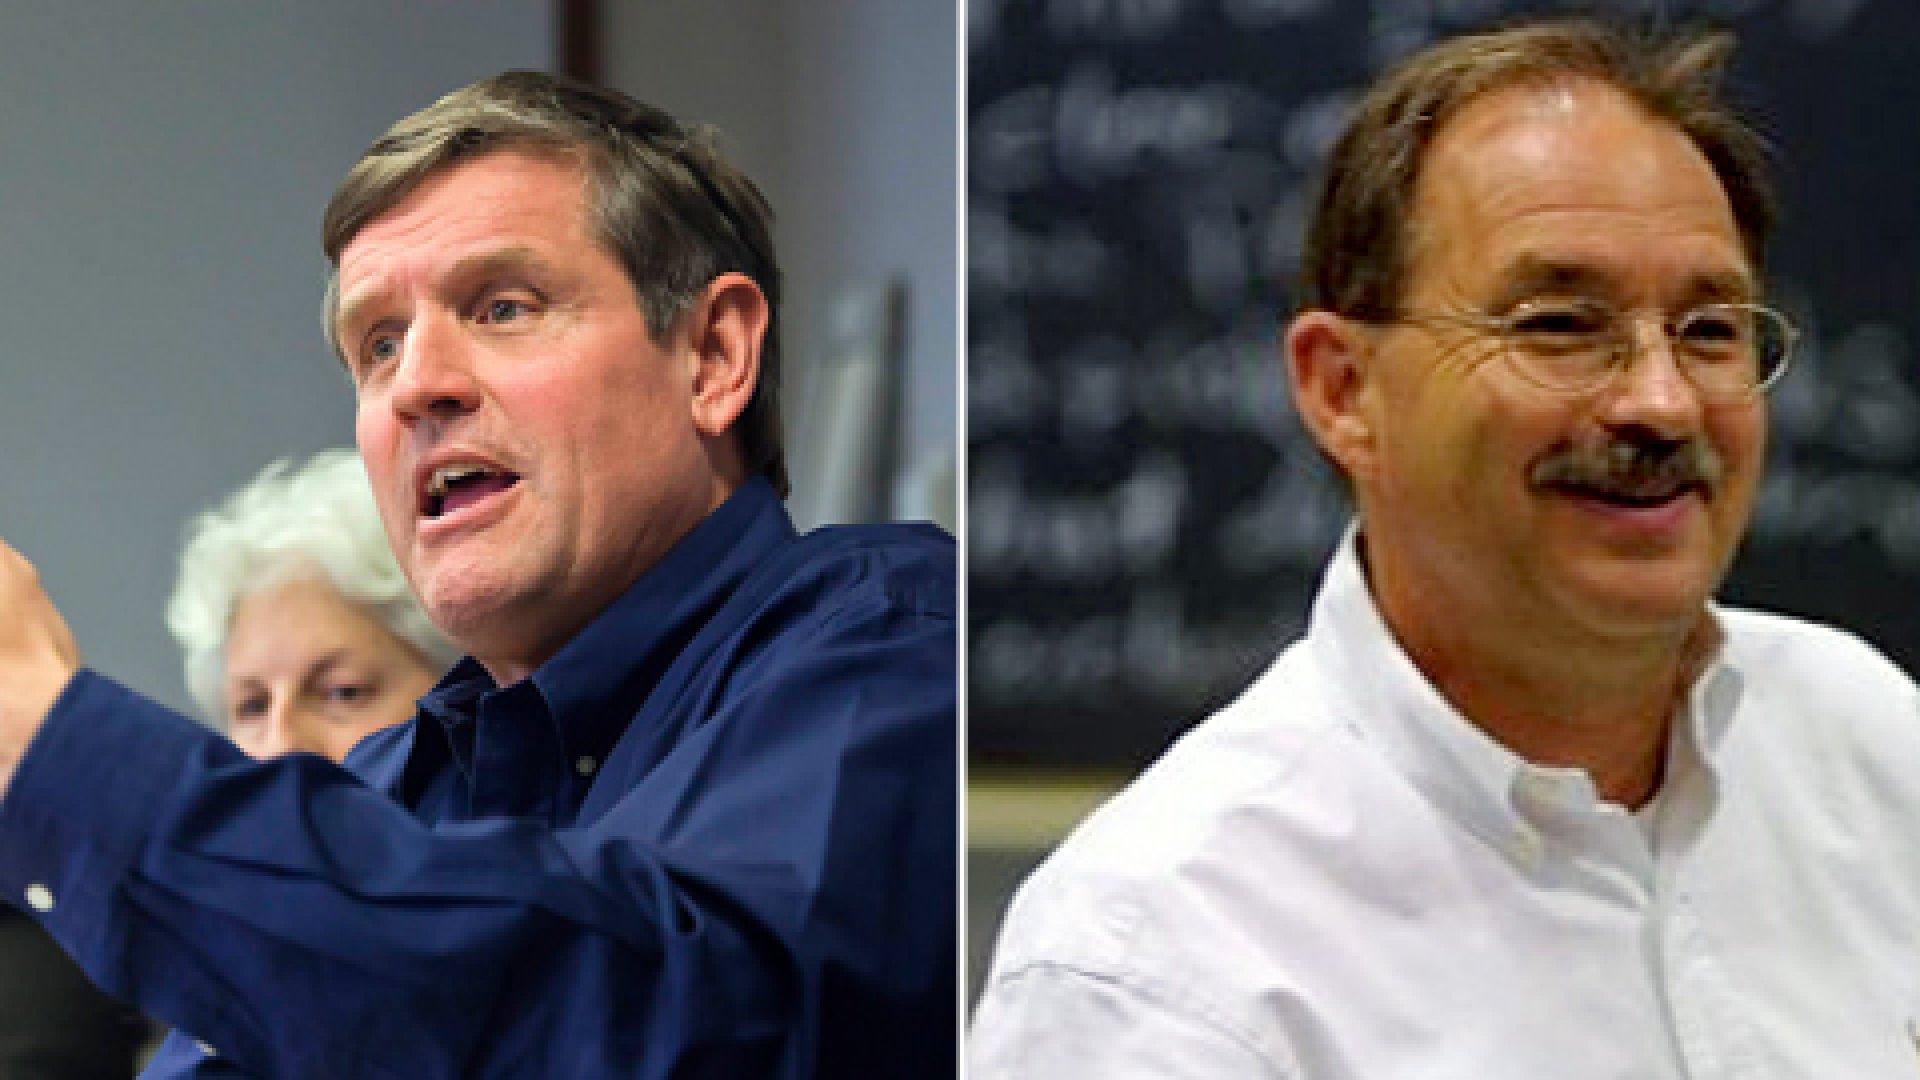 Andy Boynton (left) and Bill Fischer